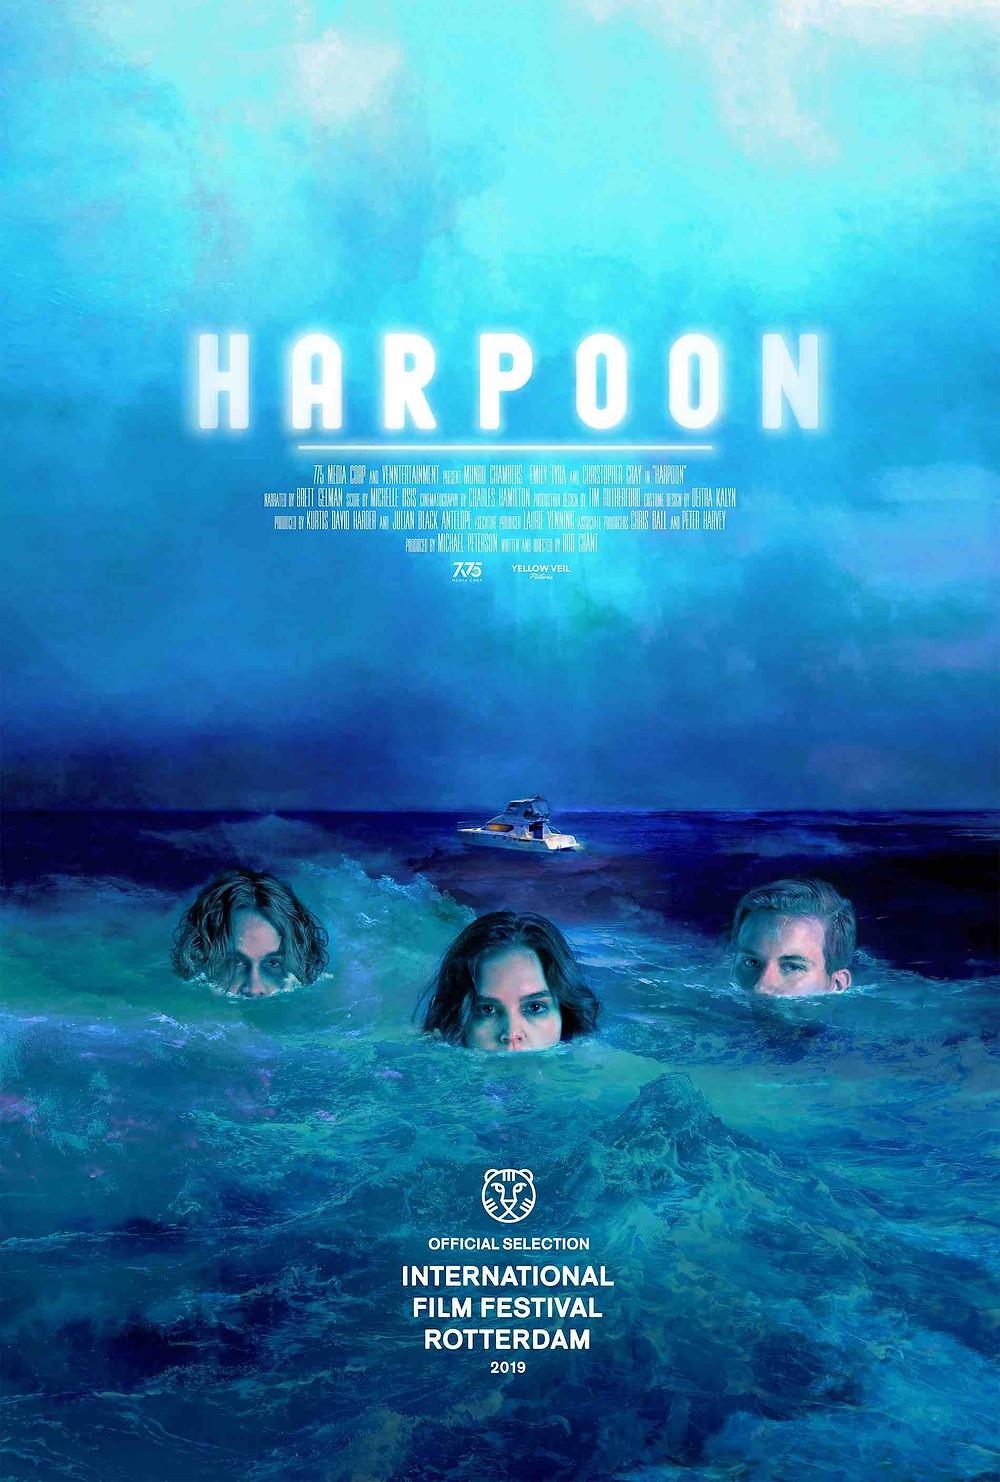 Rob Grant Harpoon Poster